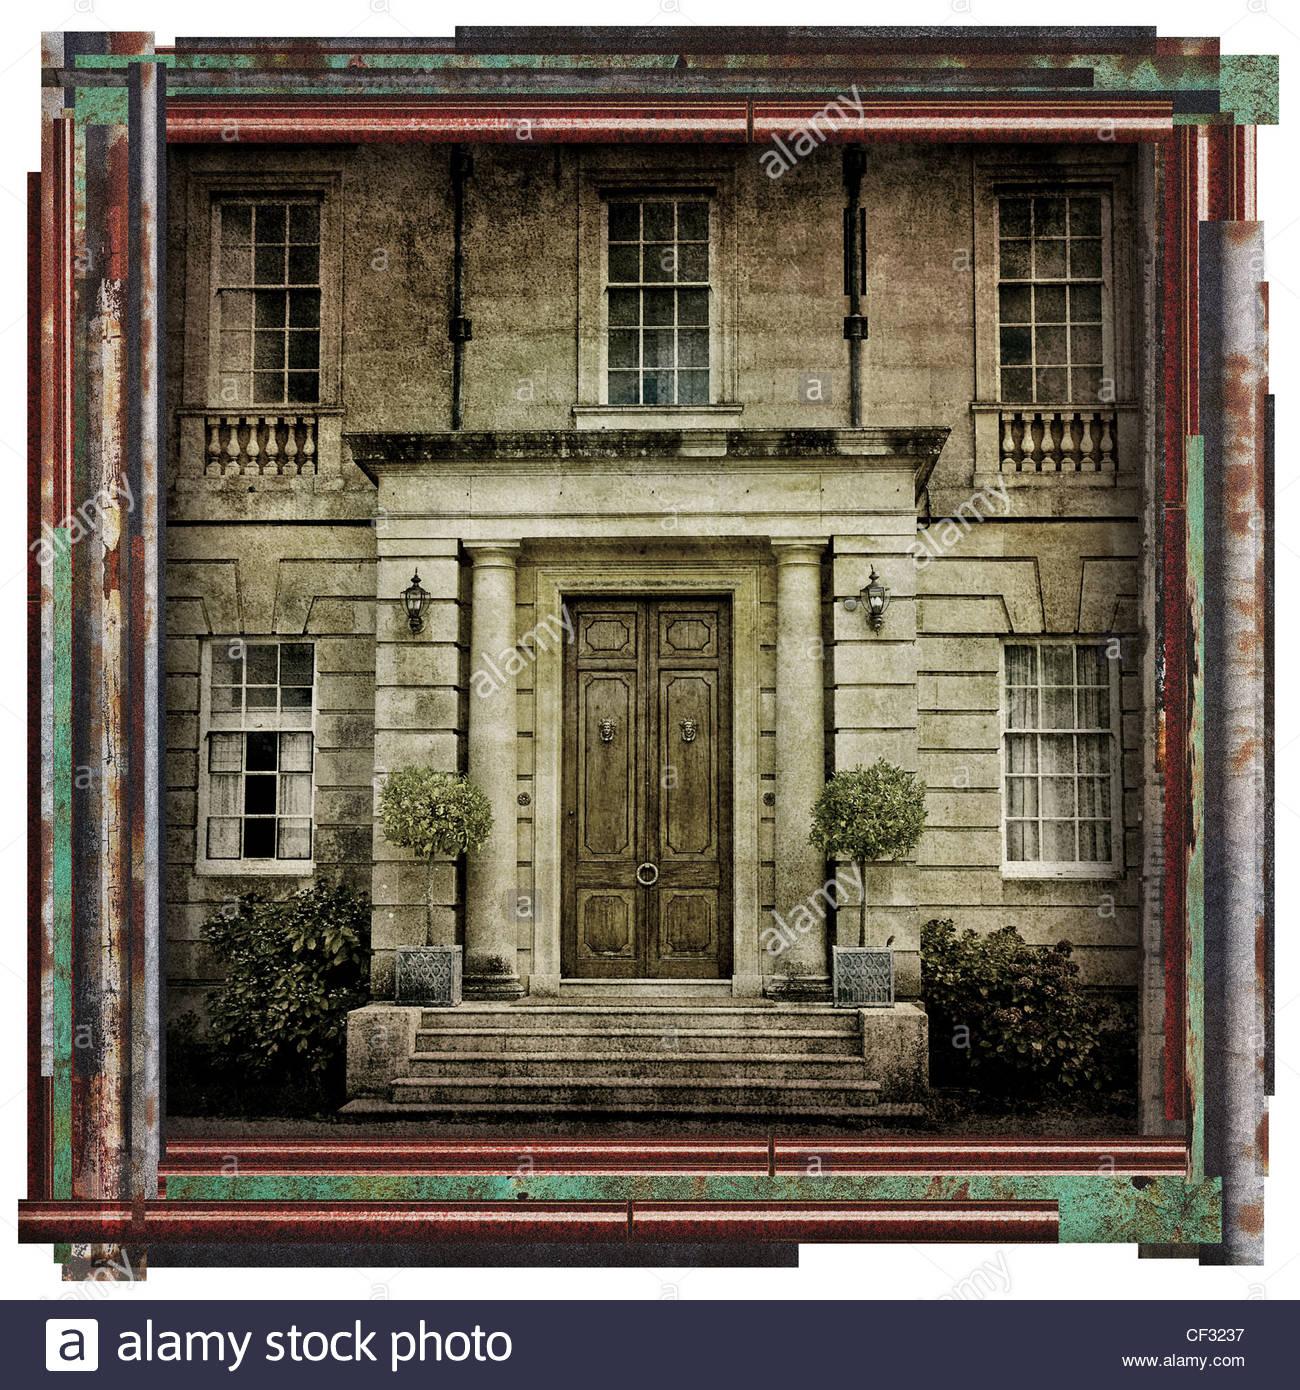 Regal House Stock Photos & Regal House Stock Images - Alamy